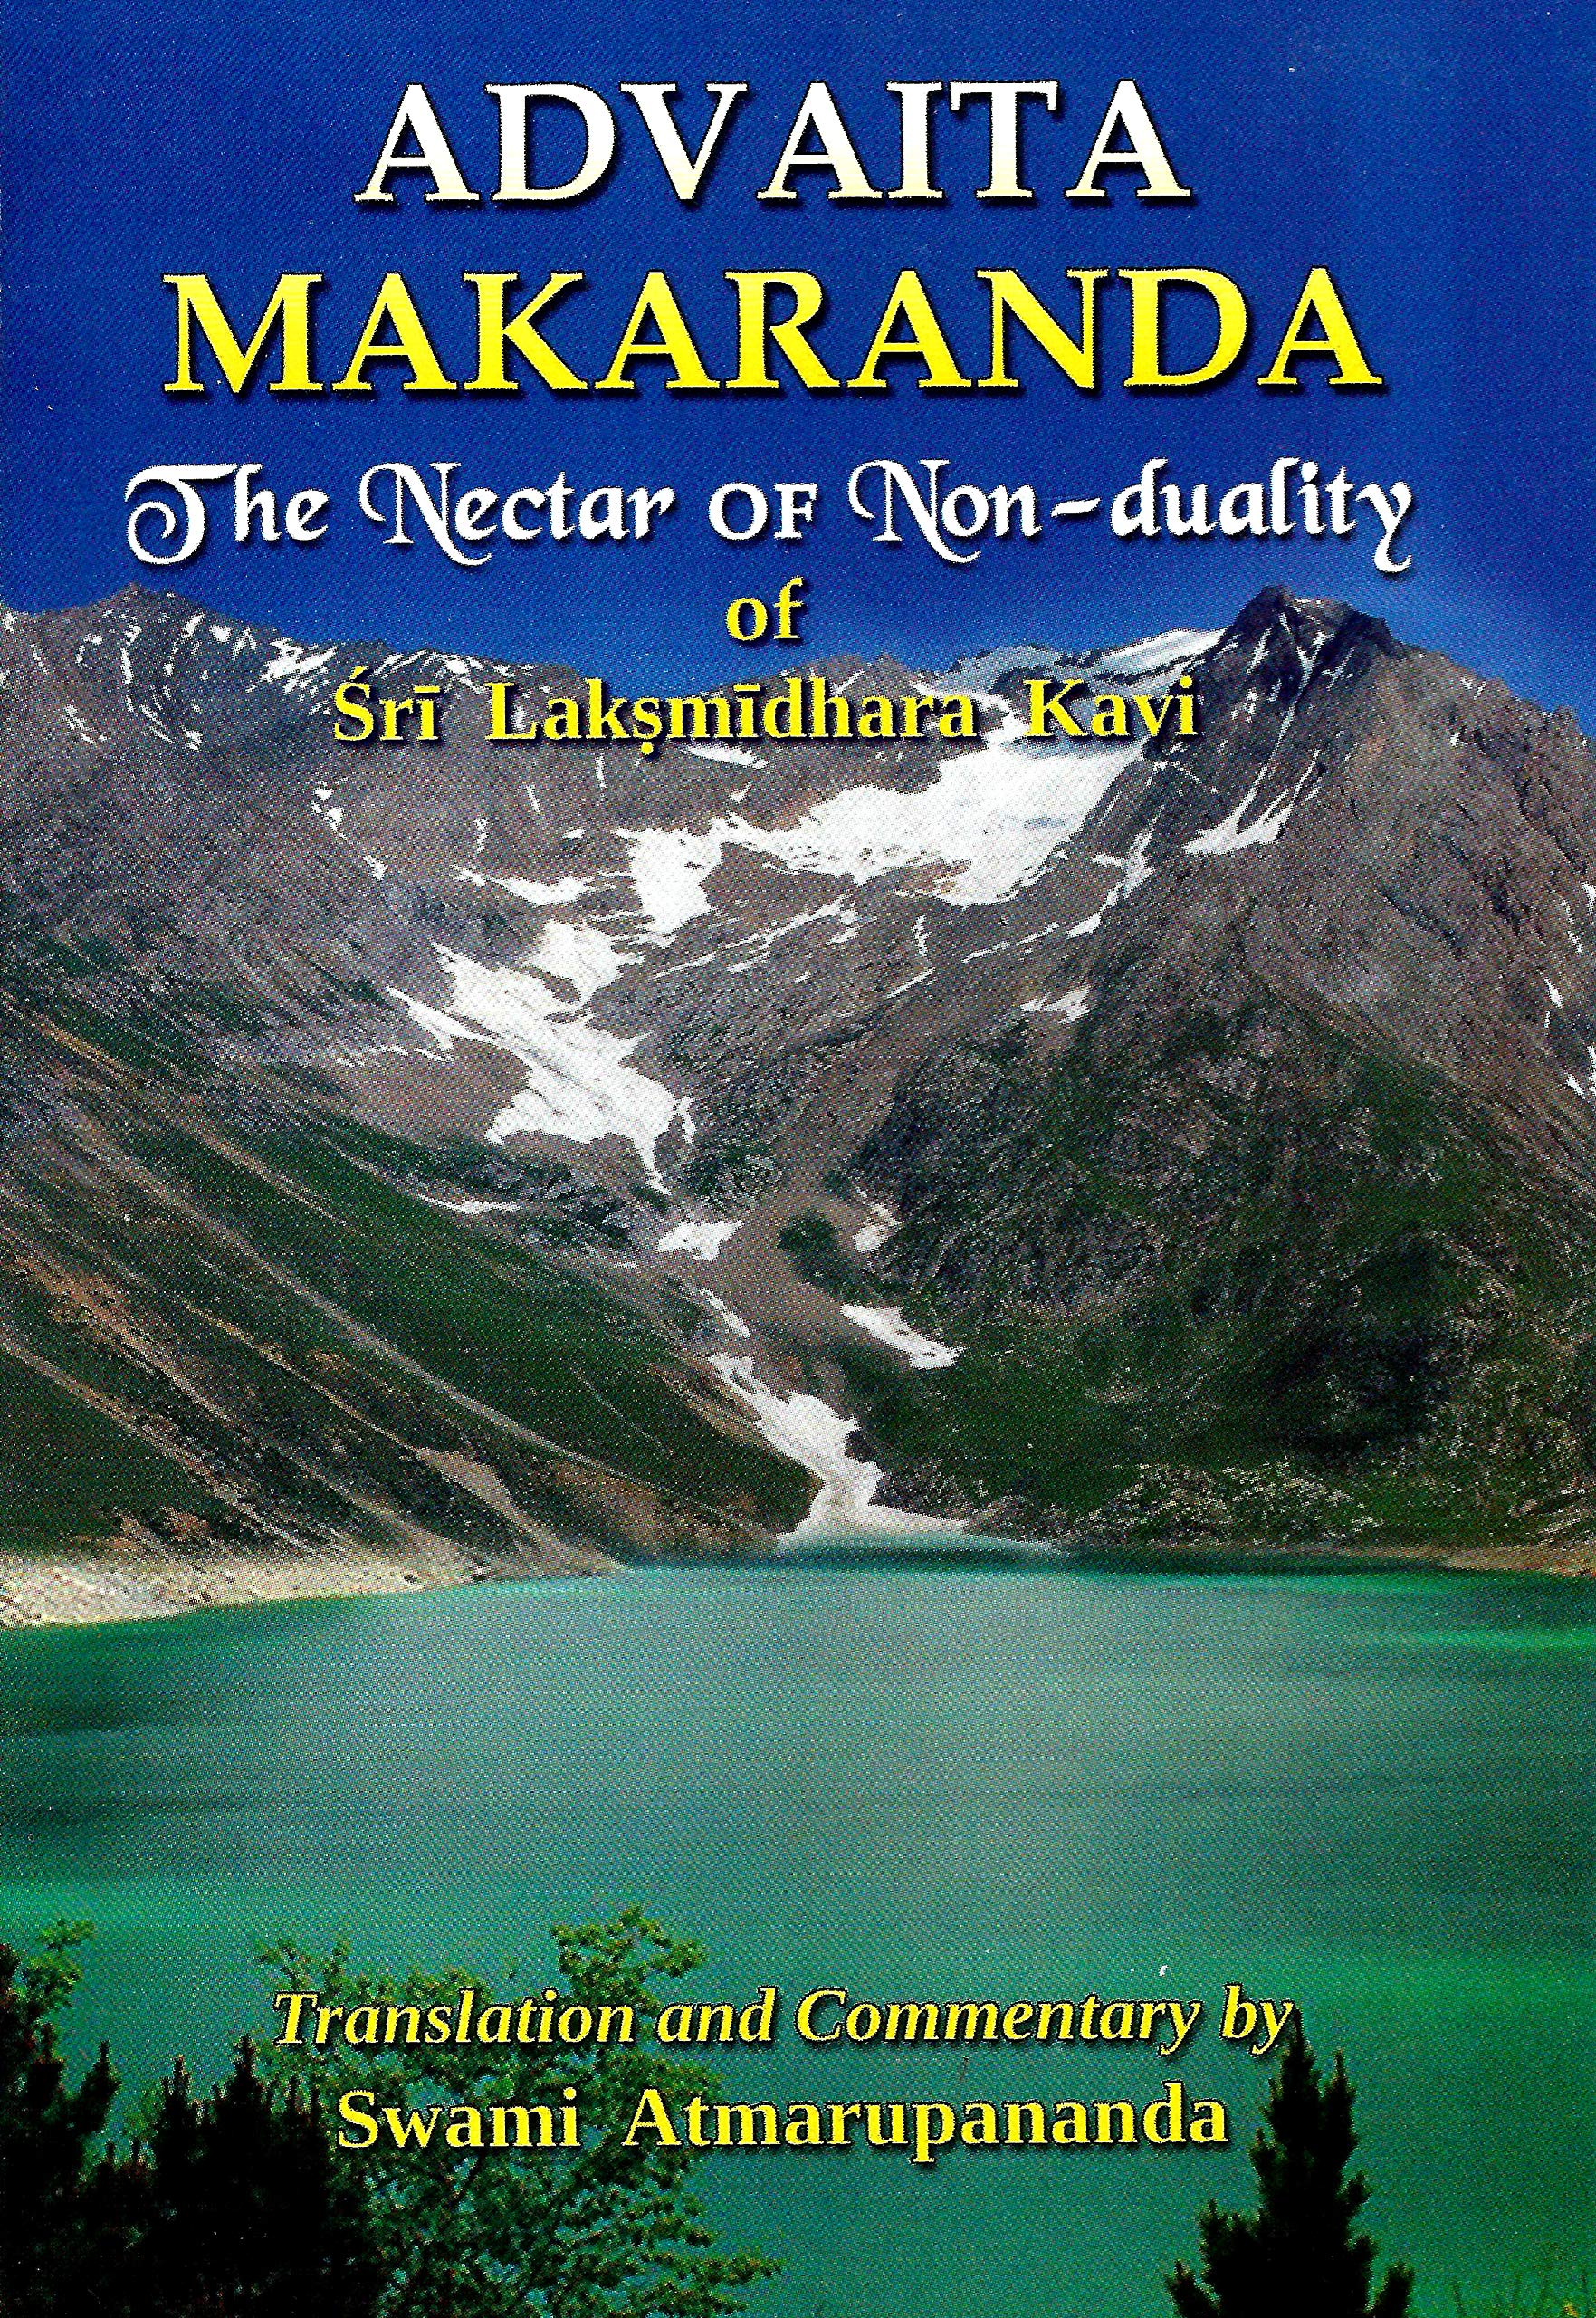 Advaita Makaranda - The Nectar of Non-duality of Sri ...